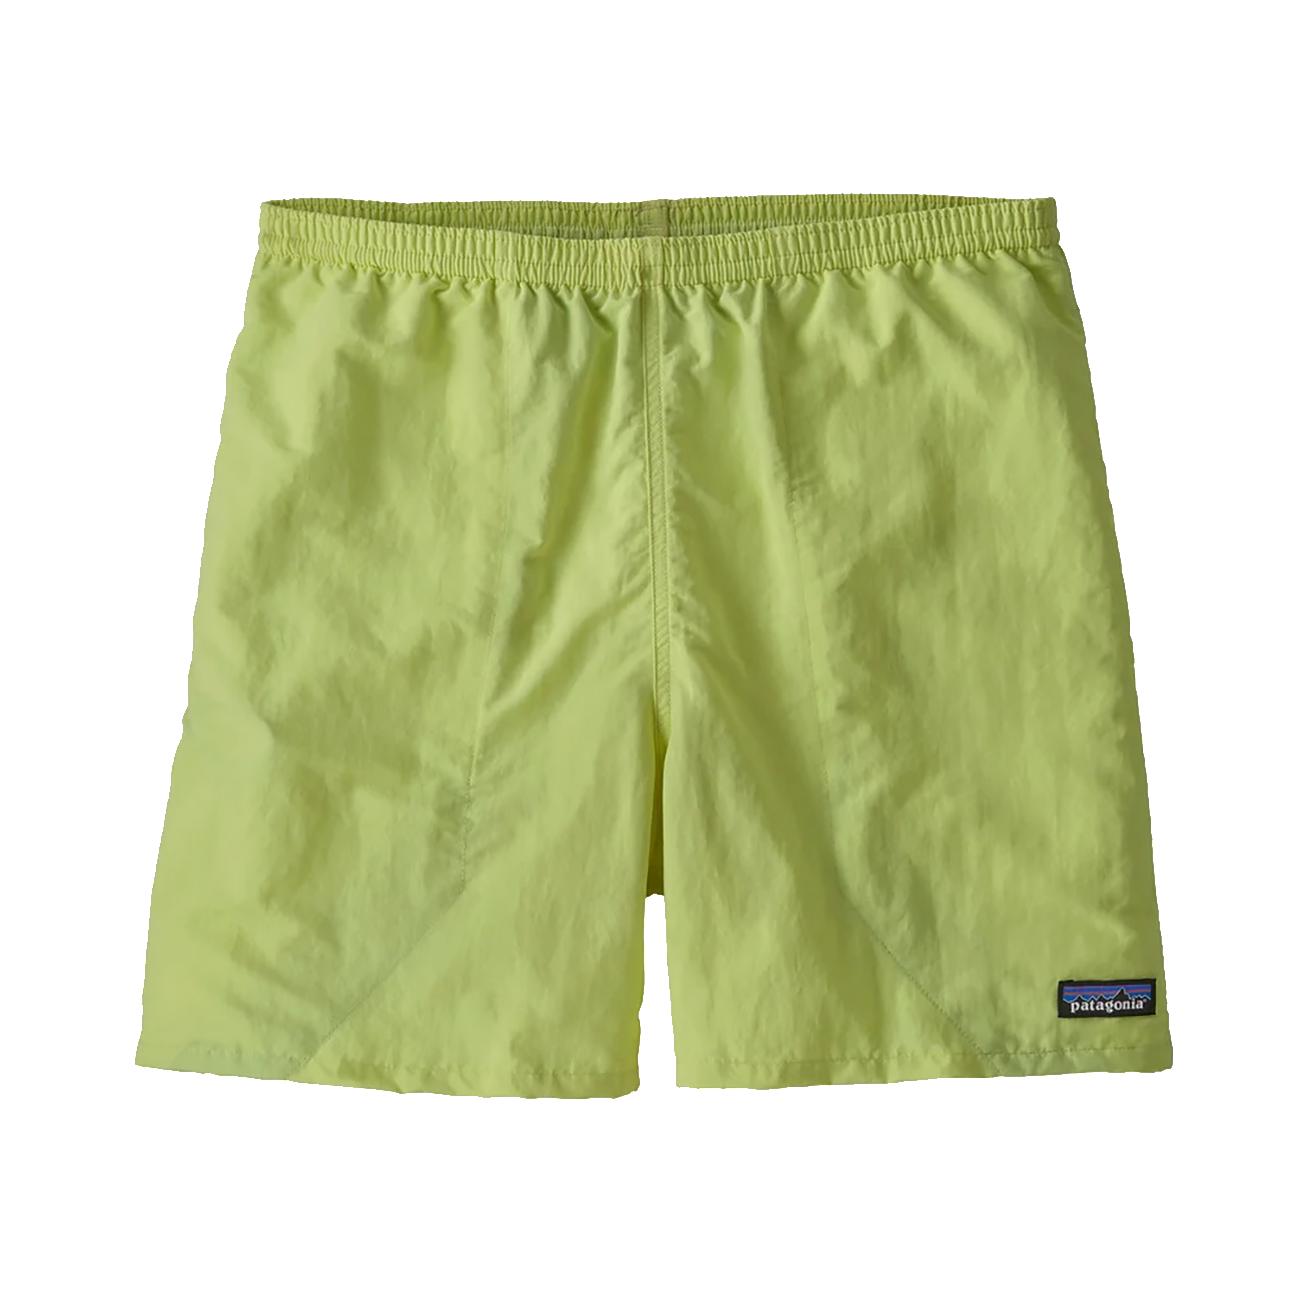 "Men's Baggies Shorts - 5"", Jellyfish Yellow-1"